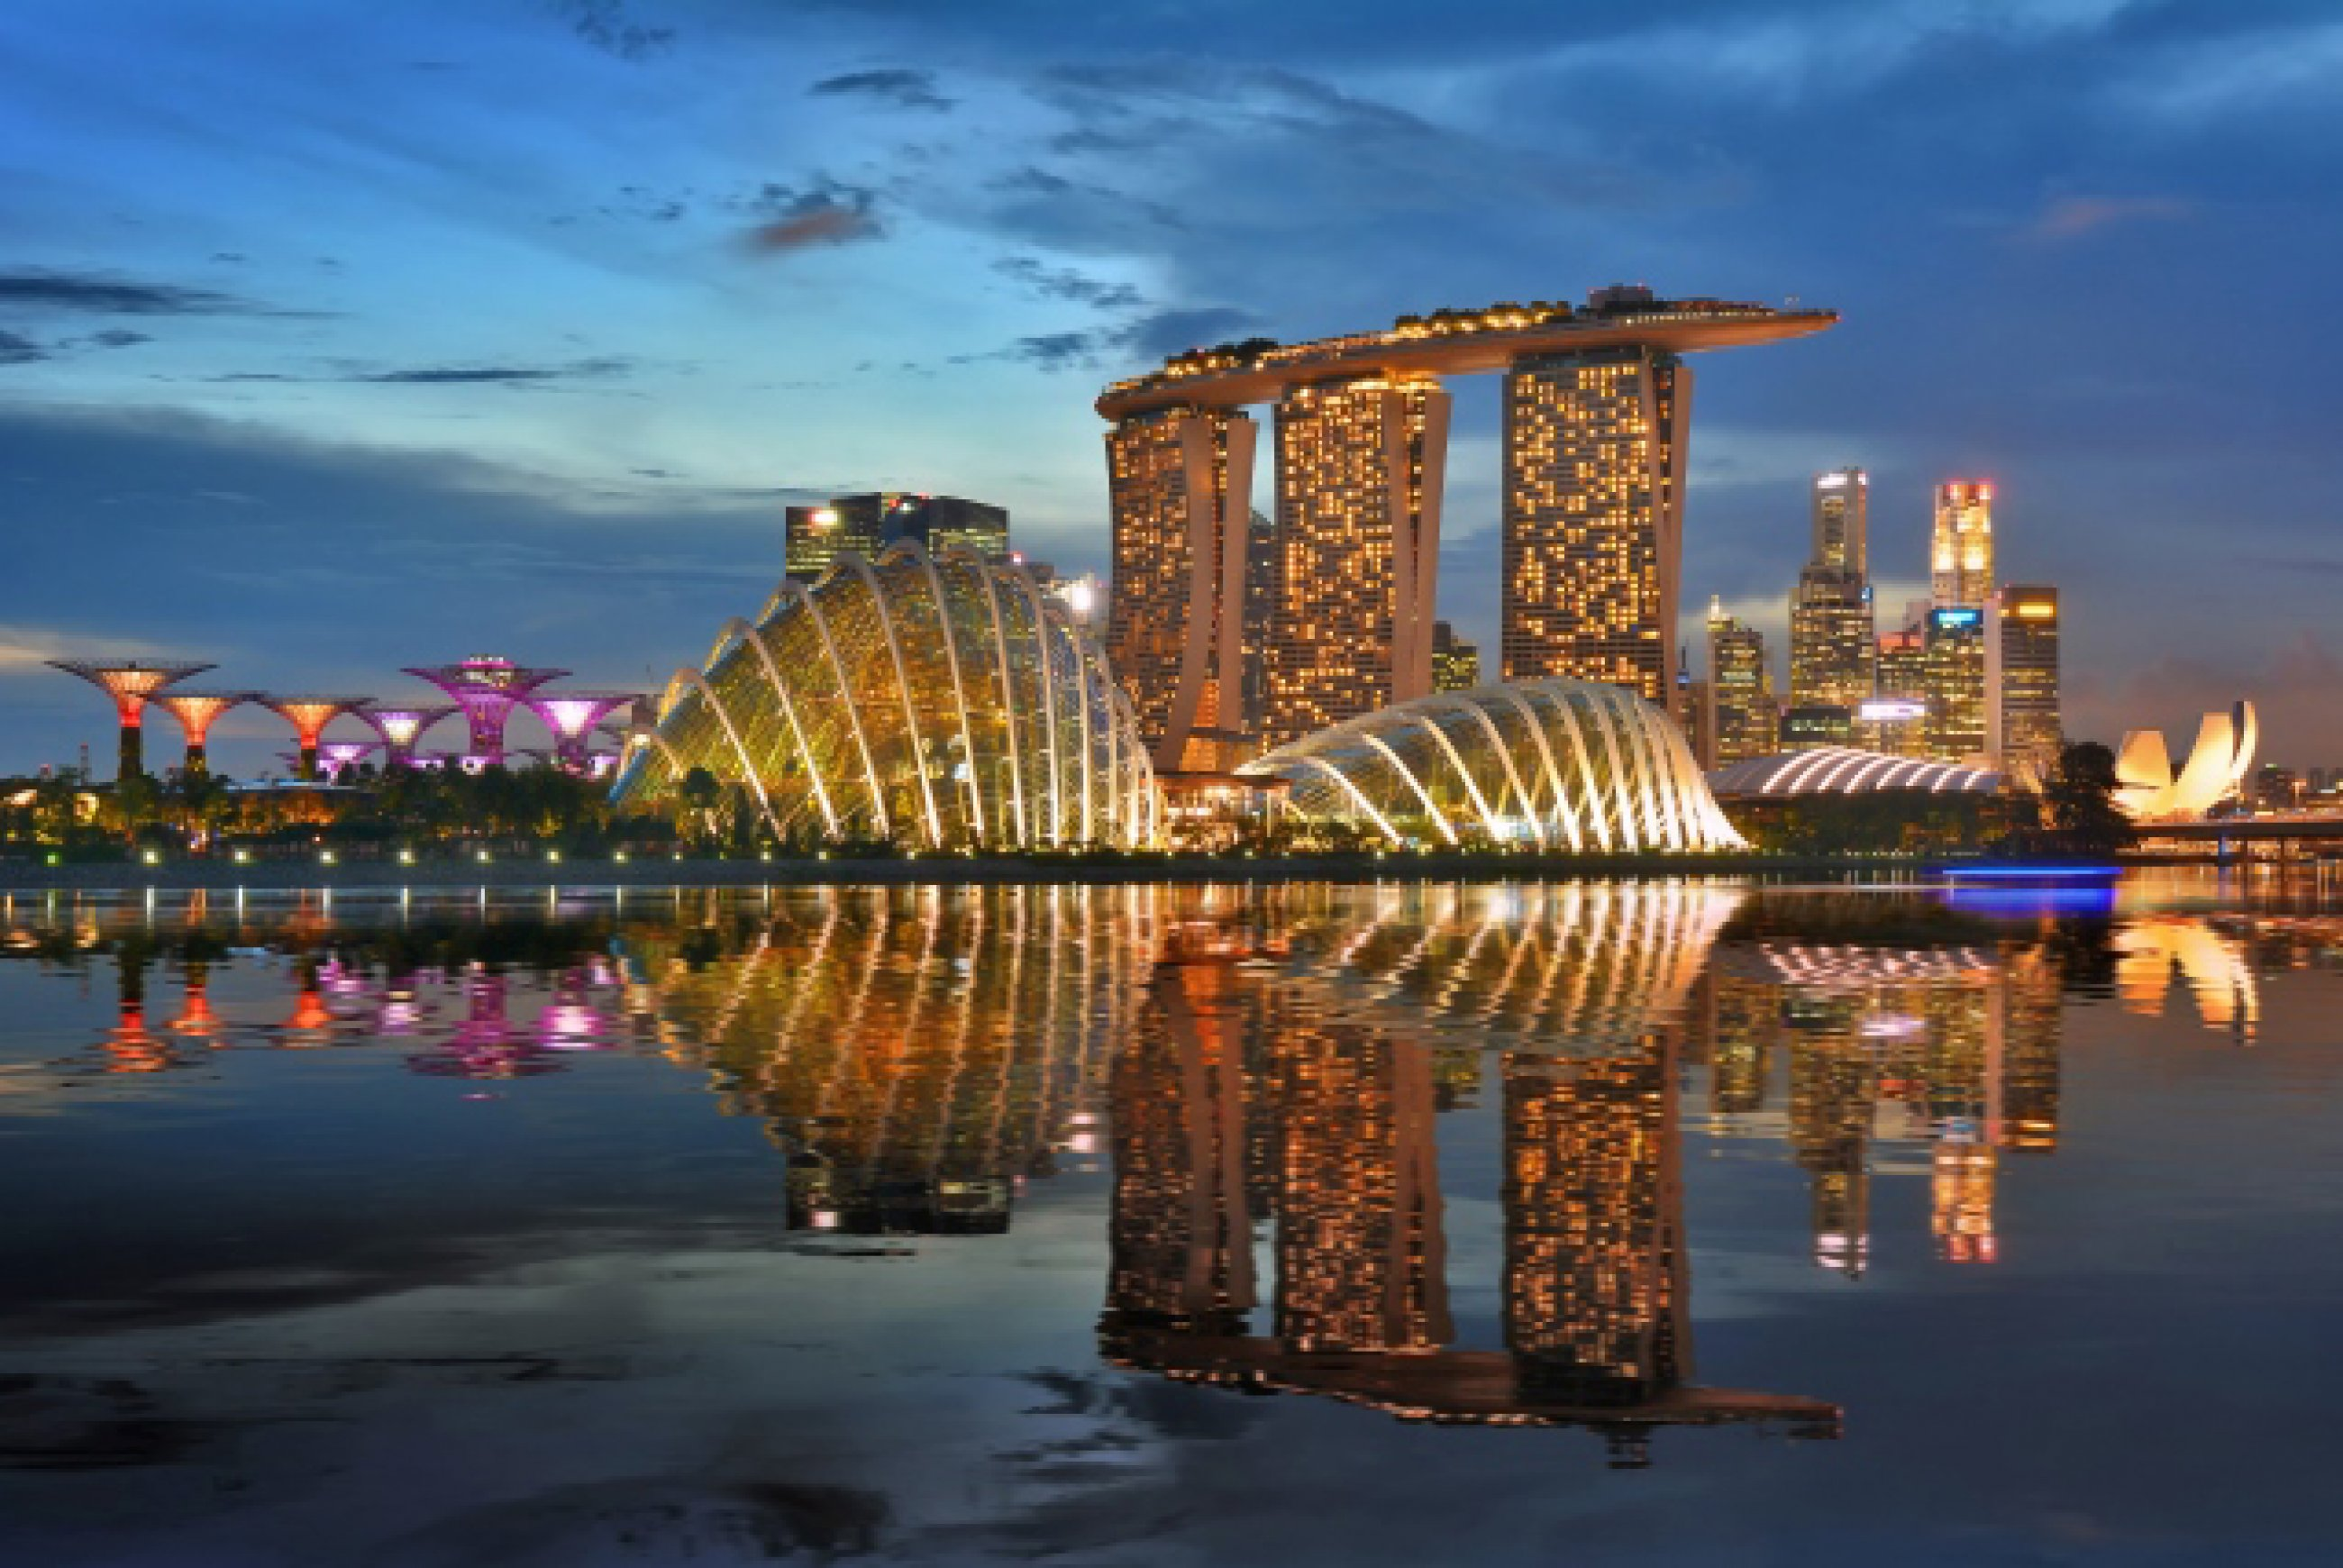 https://bubo.sk/uploads/galleries/8377/building-in-singapore.jpg